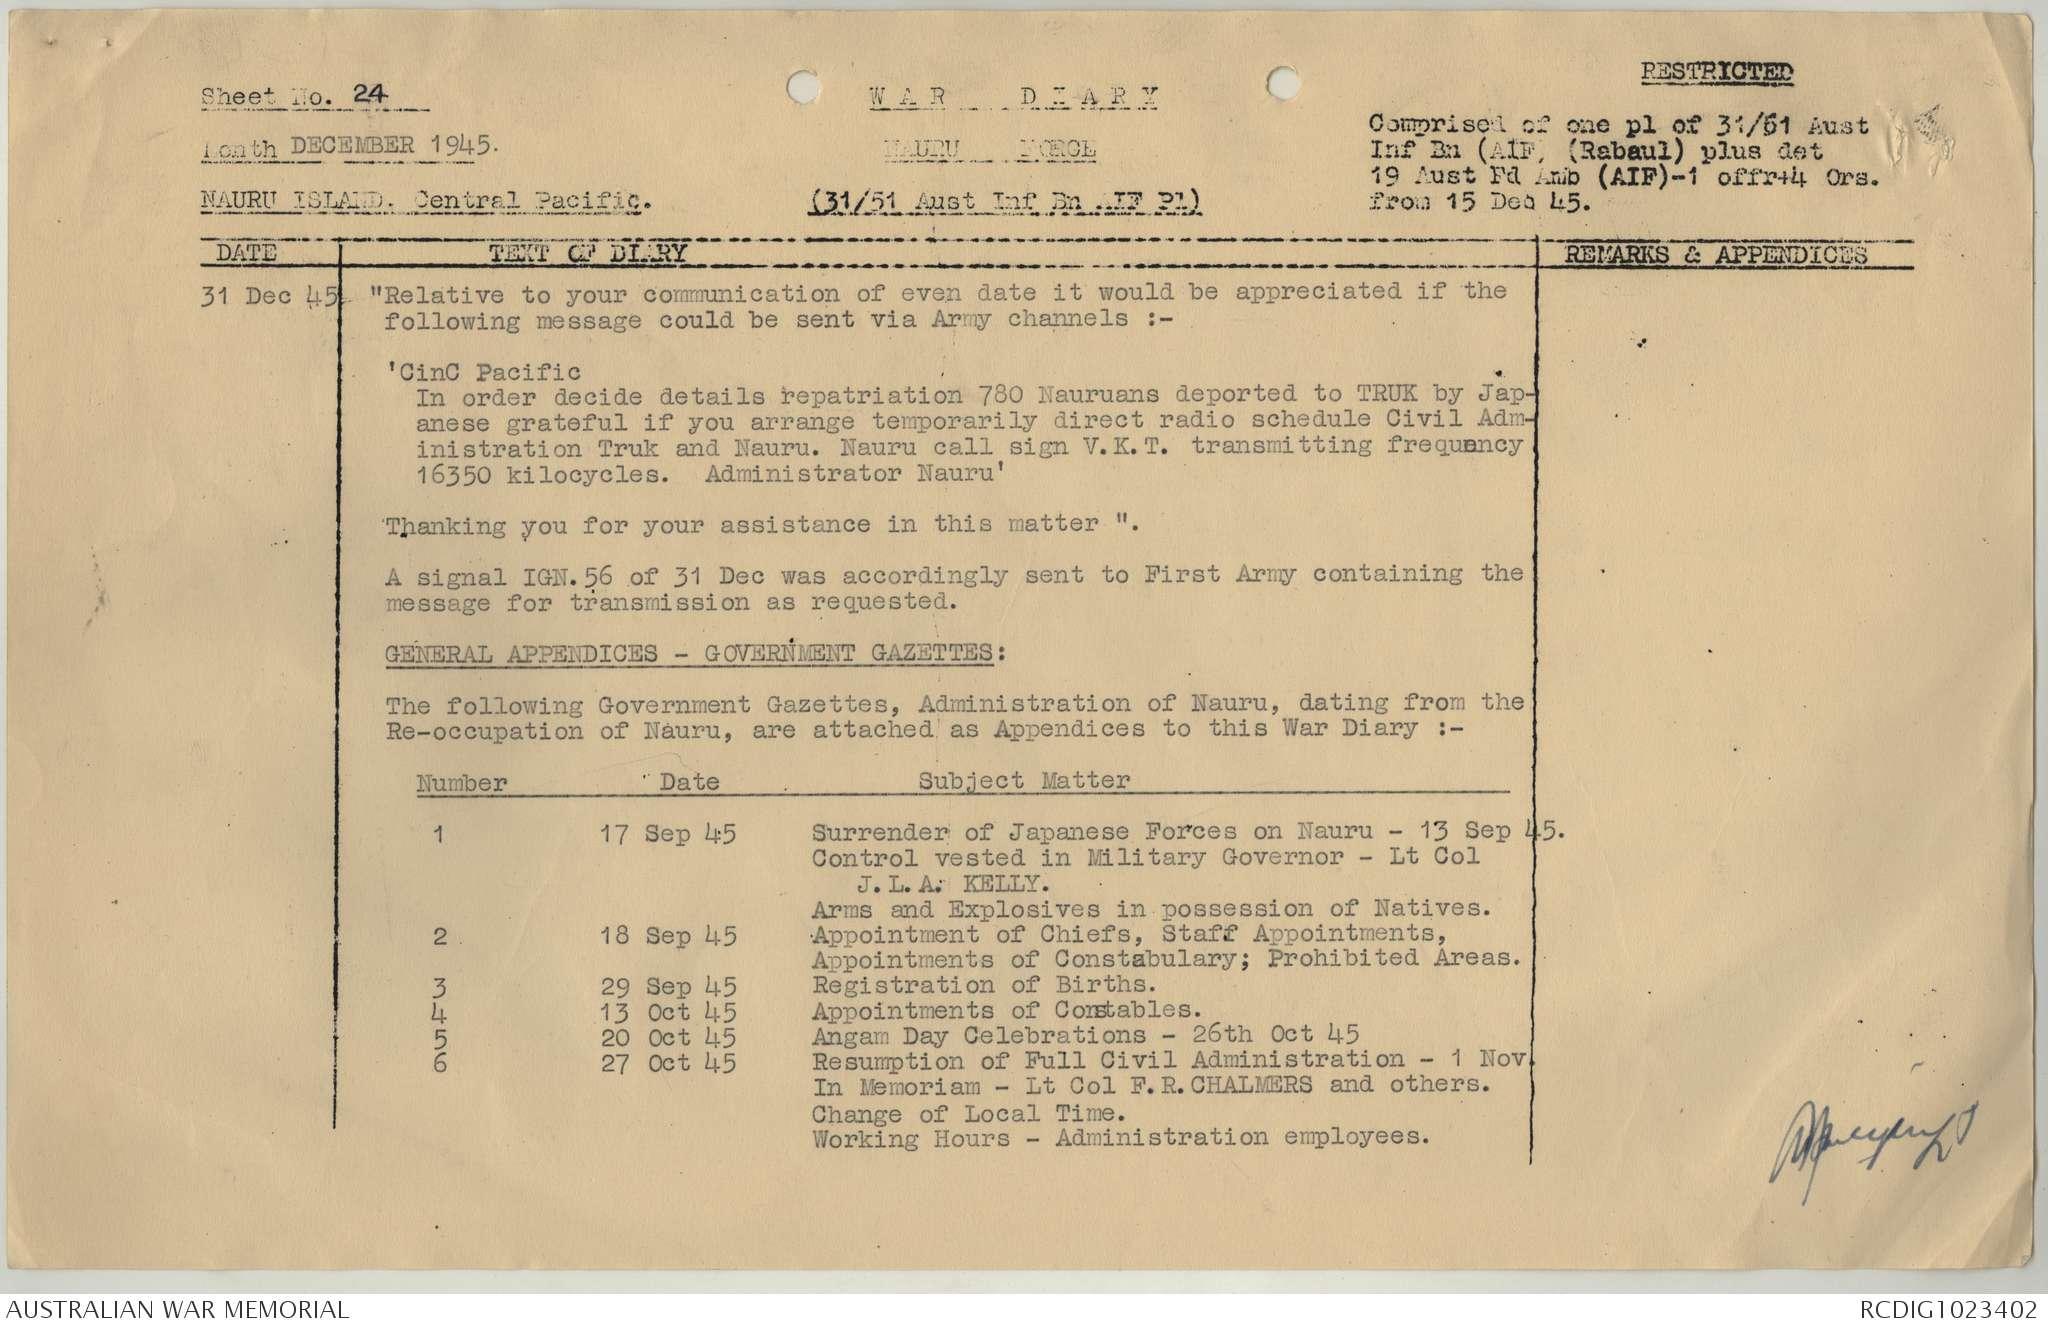 AWM52 8/3/70/41 - December 1945 | The Australian War Memorial